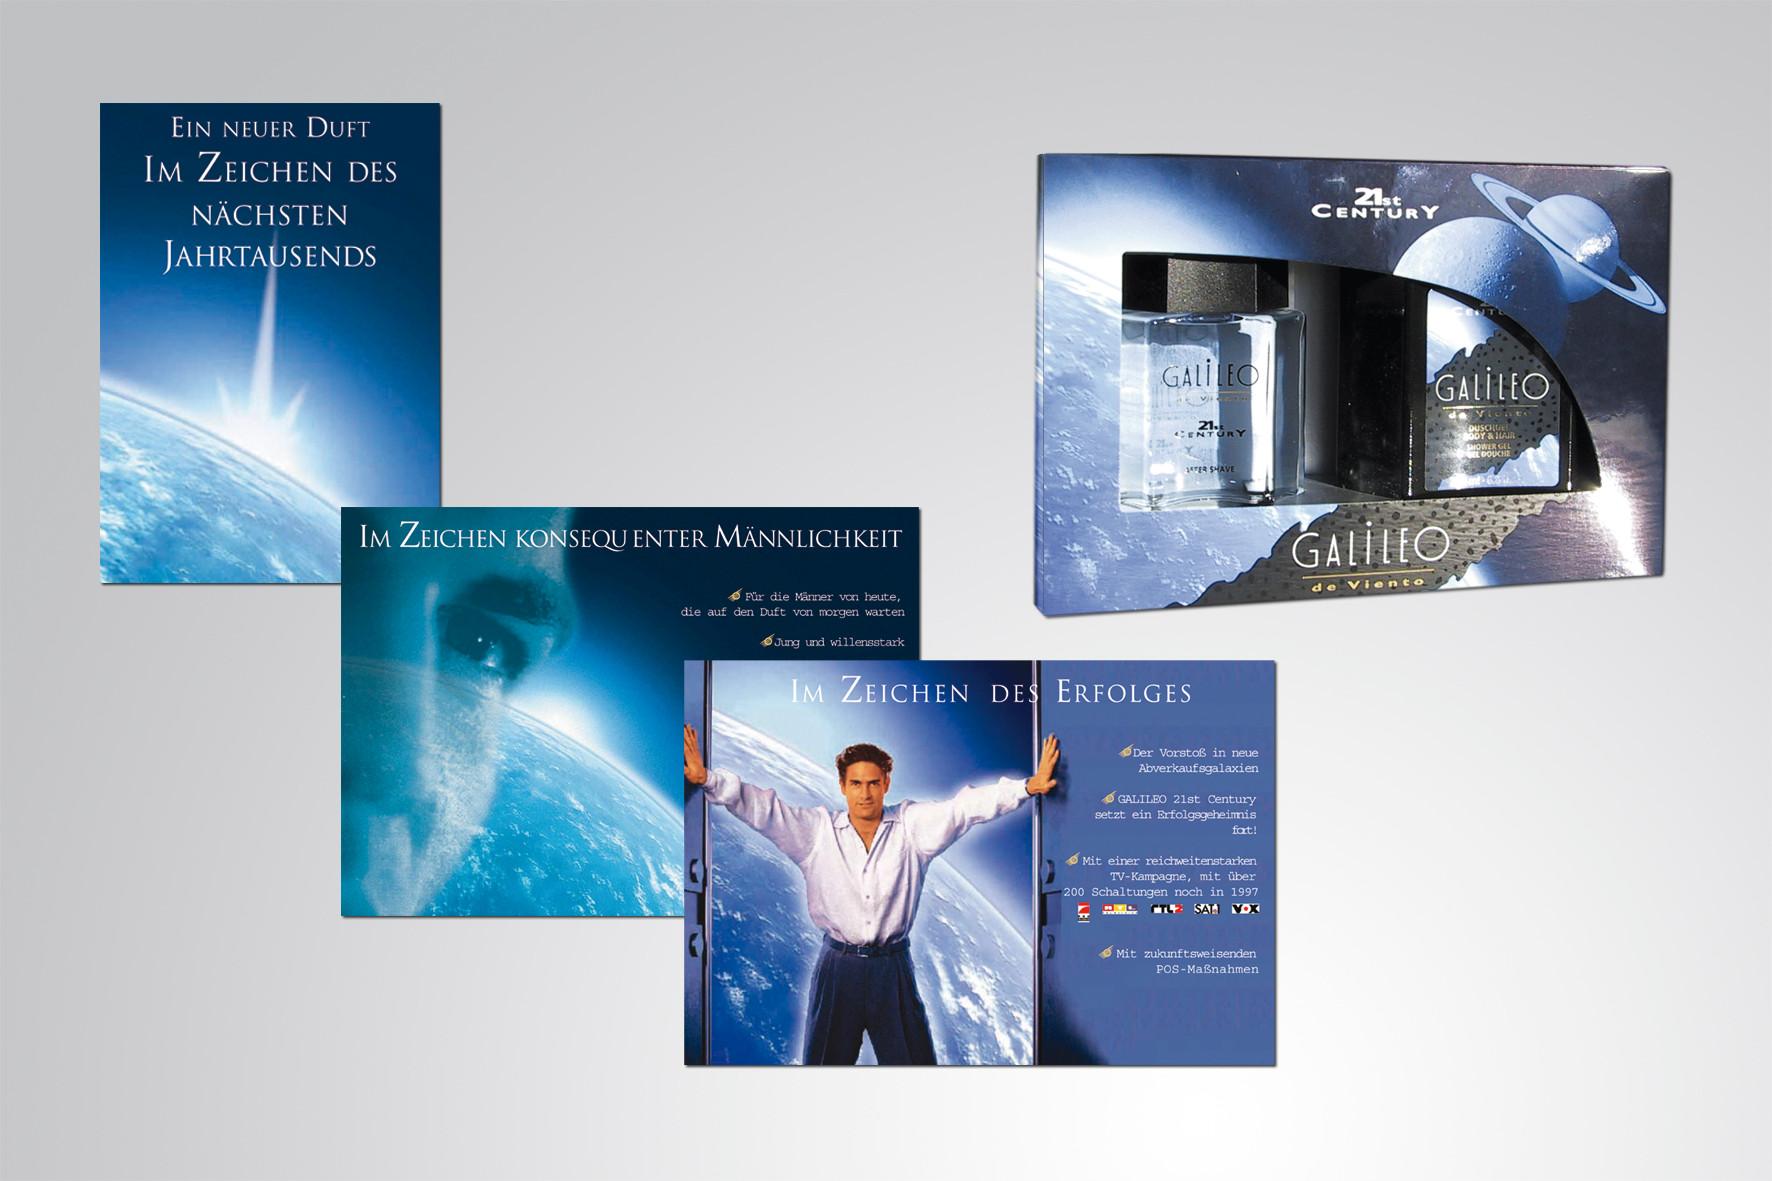 Kunde: Cosmopolitan Cosmetics · Produkt: Galileo 21st Century VKF Maßnahmen